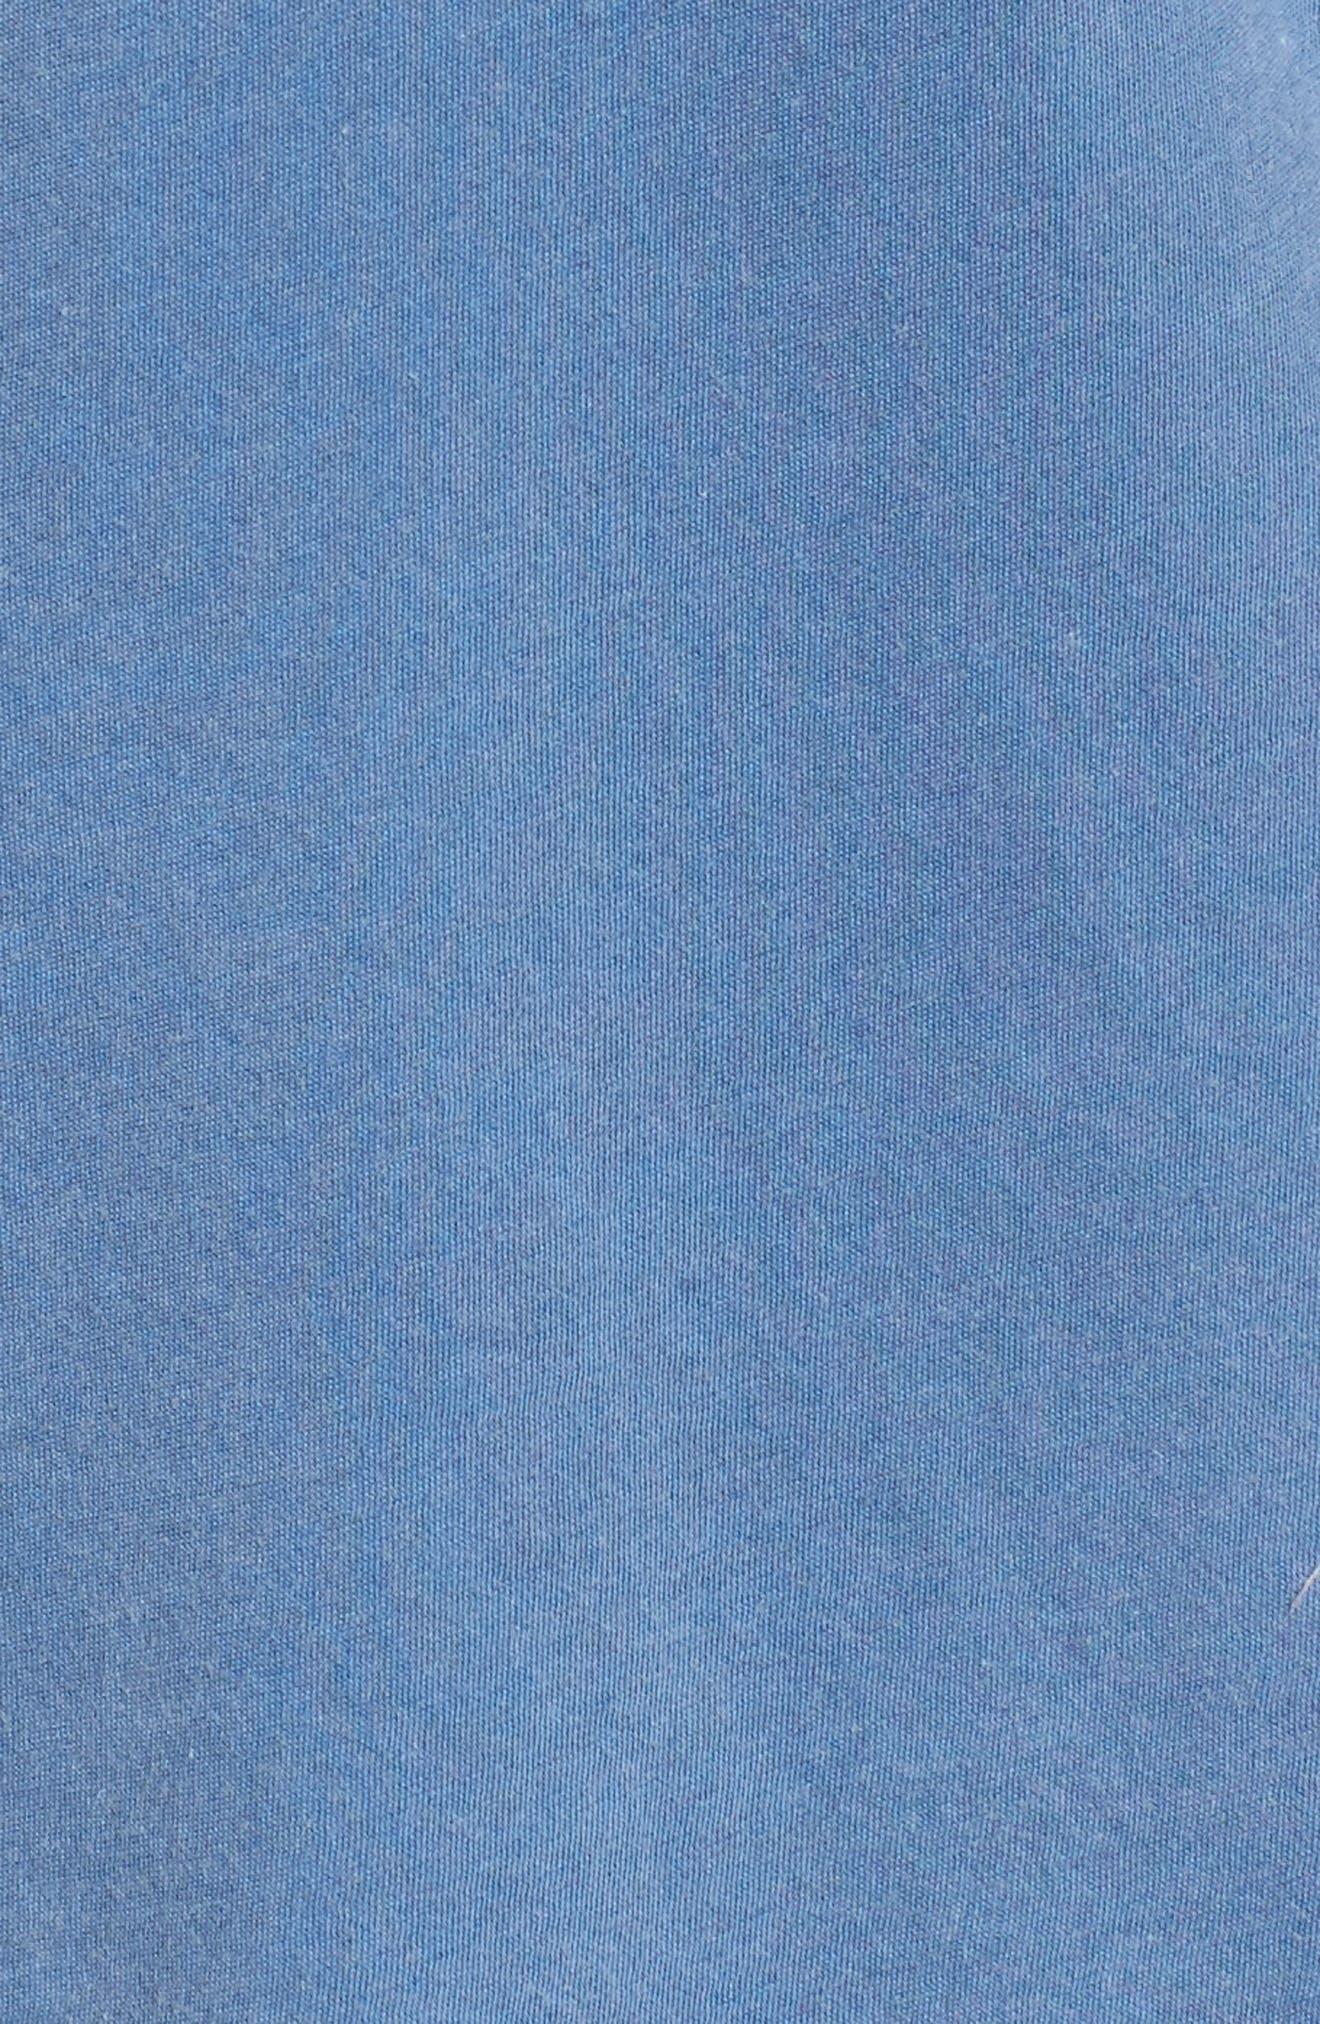 Layered Tee,                             Alternate thumbnail 5, color,                             Vintage Blue